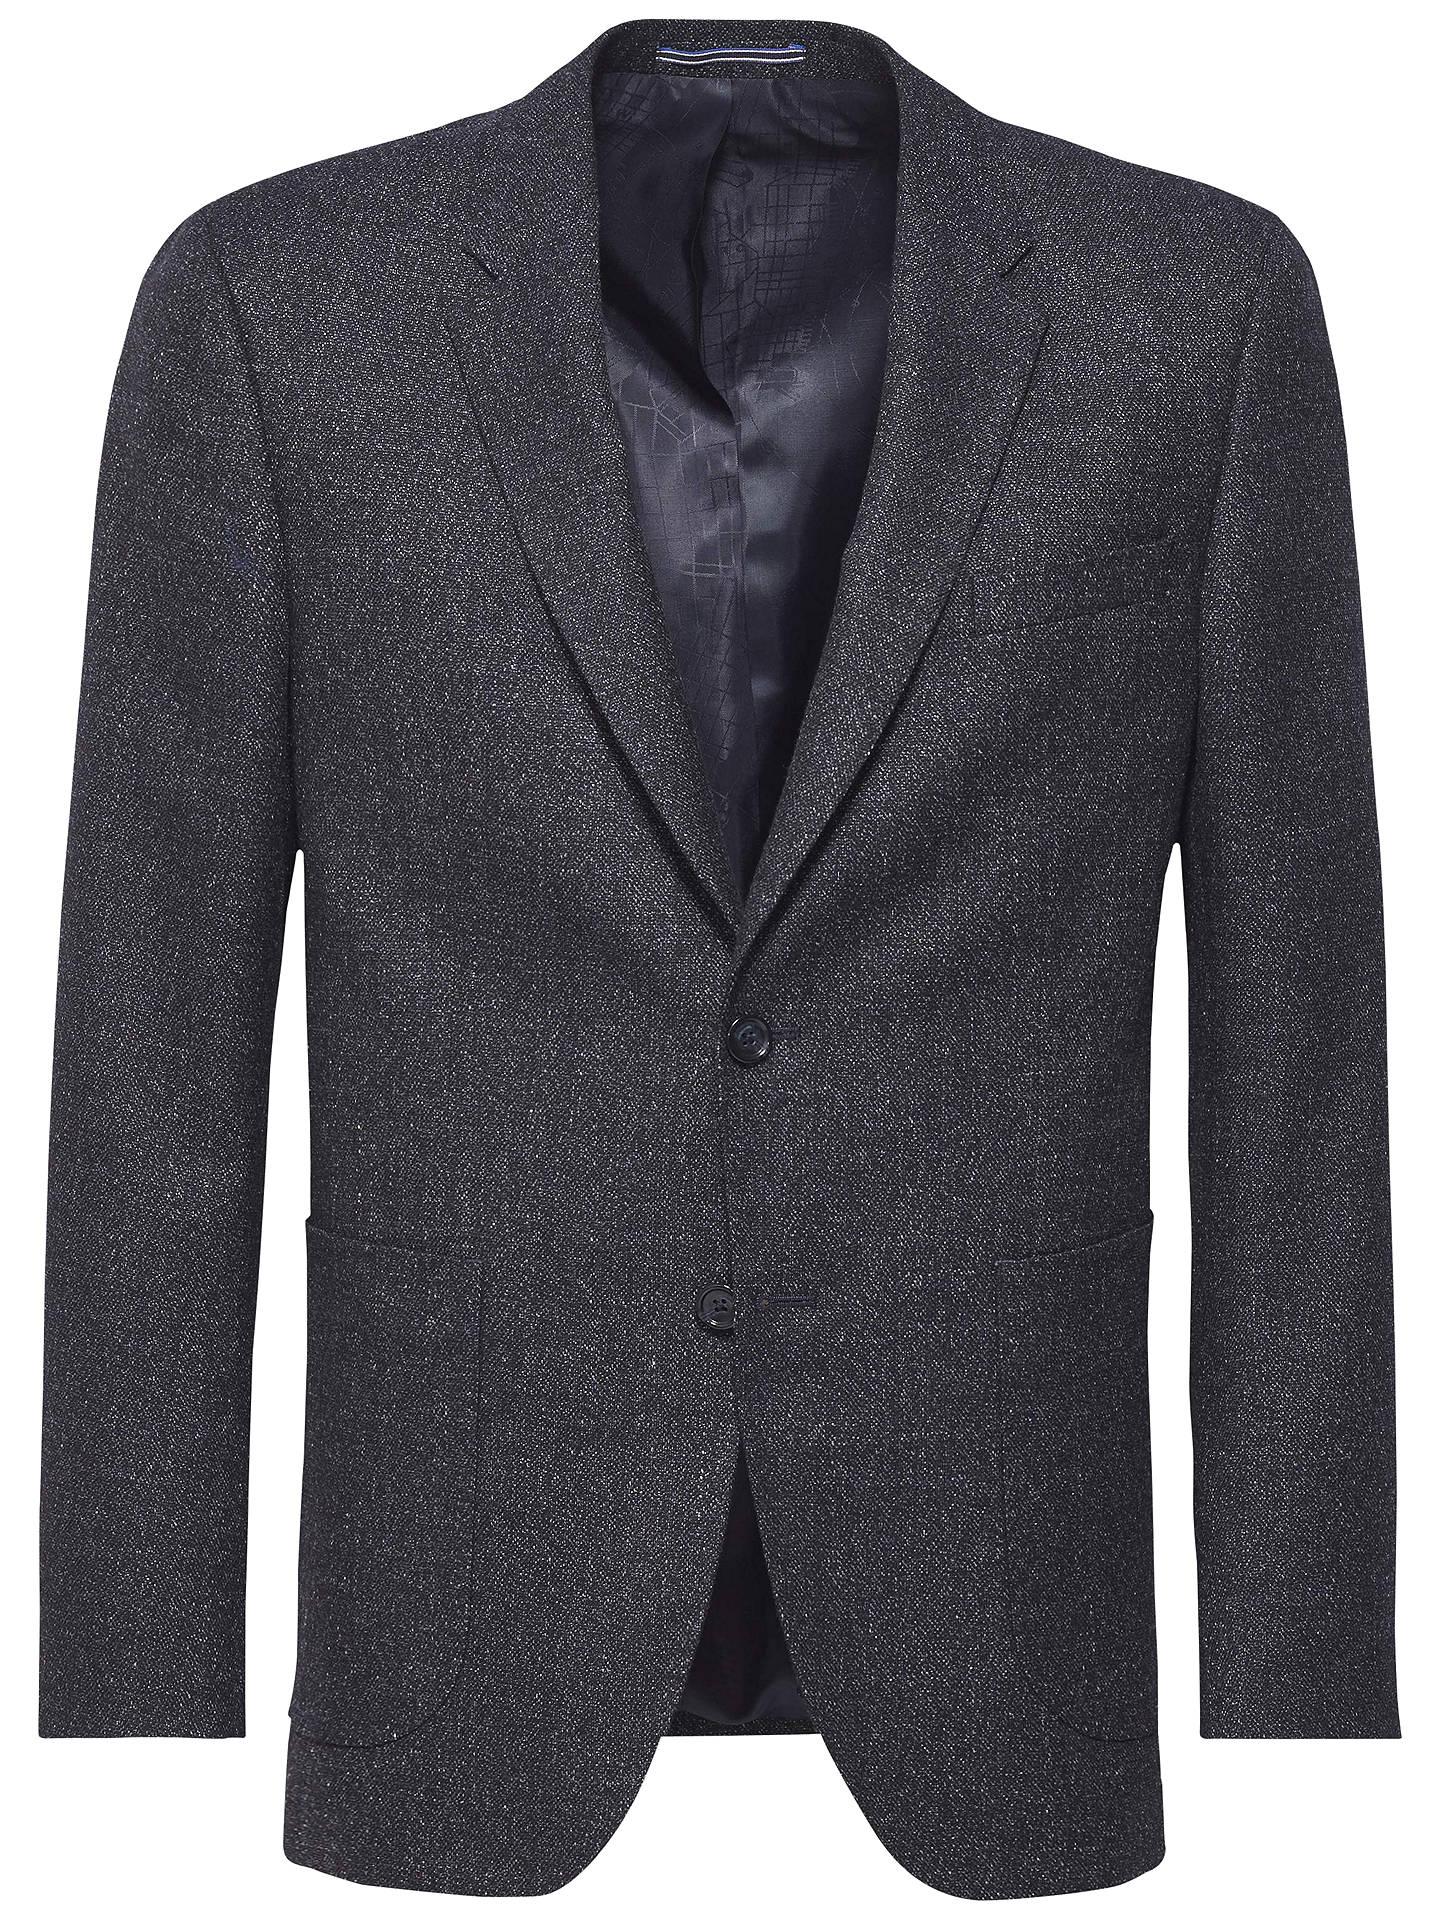 cfa577de Buy Tommy Hilfiger Tailored Wool Blend Blazer, Navy, 38L Online at  johnlewis.com ...